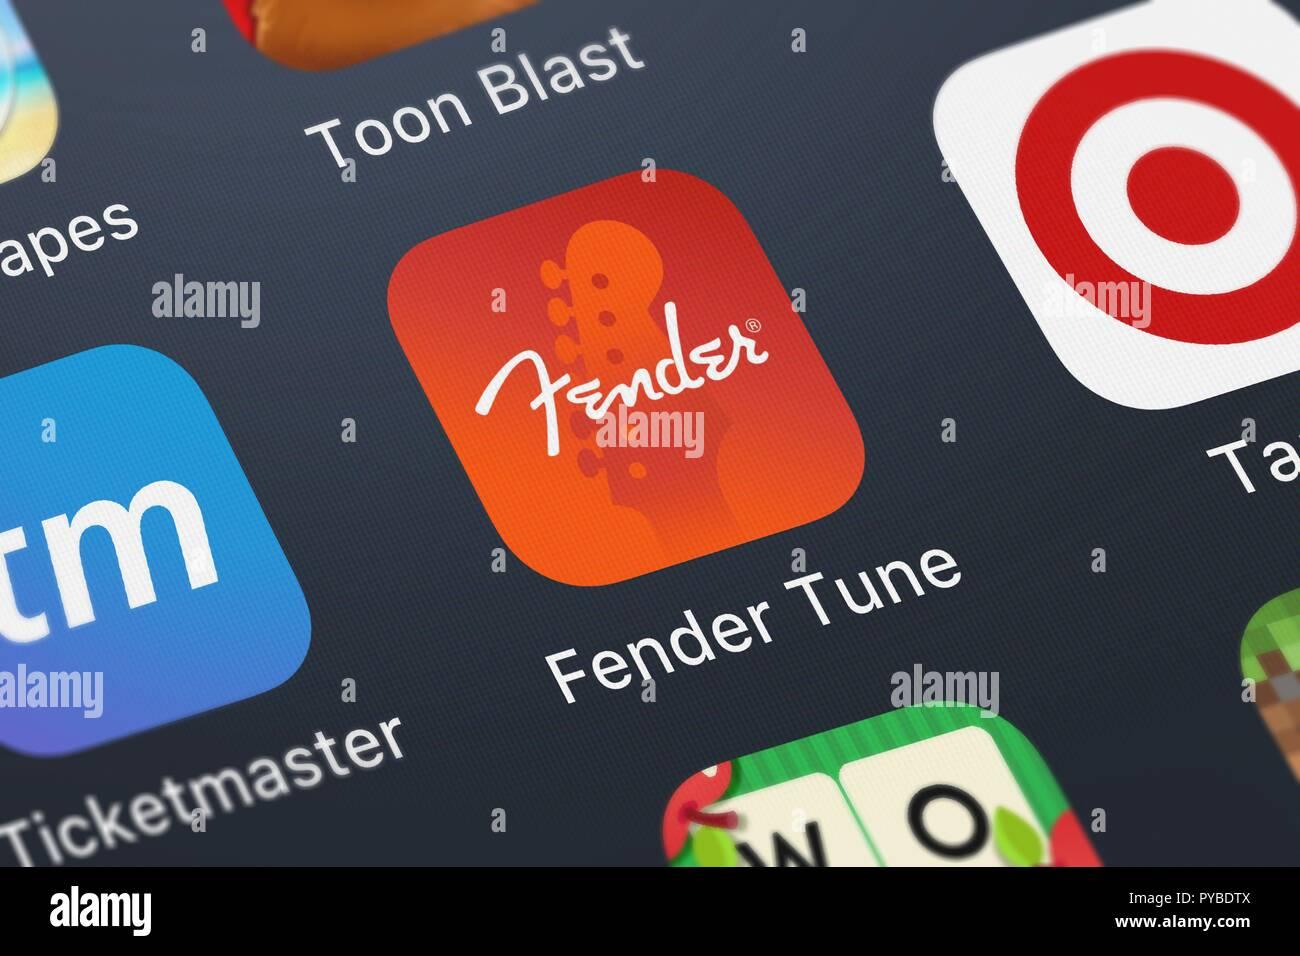 London, United Kingdom - October 26, 2018: Screenshot of Fender Digital's mobile app Fender Tune - Guitar Bass Uke. - Stock Image